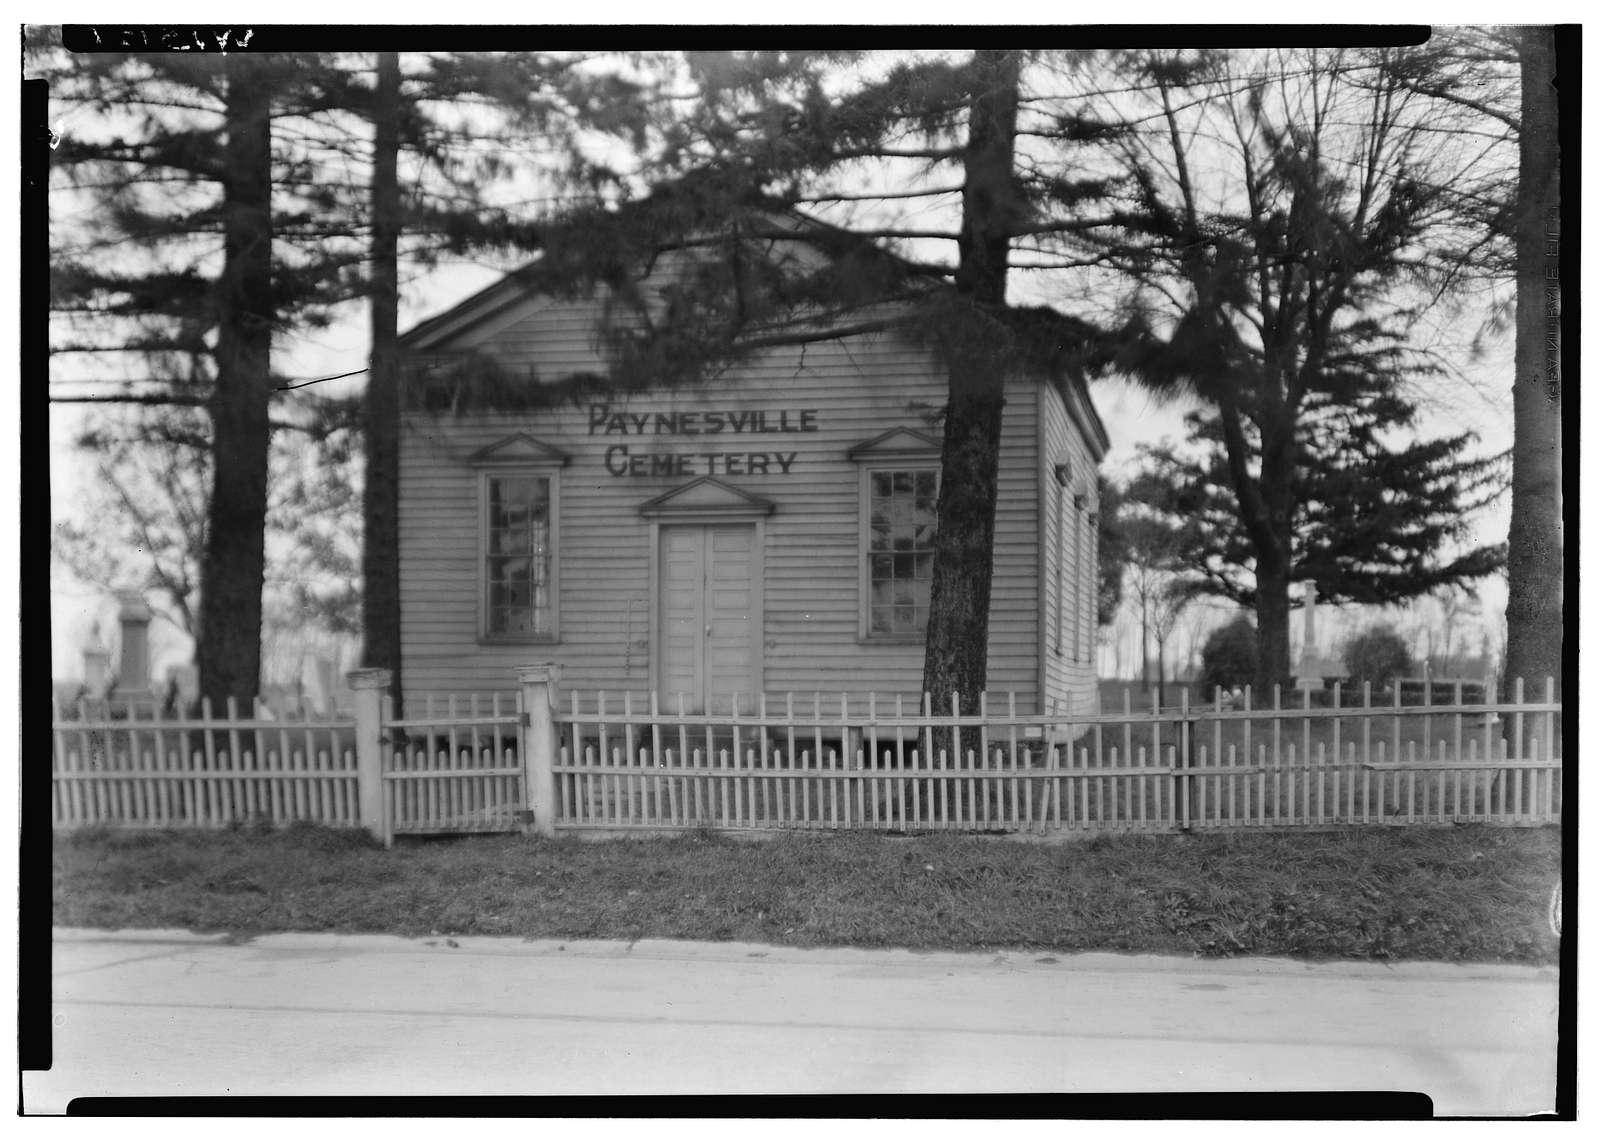 Paynesville Cemetery Chapel, Rock Creek Vicinity, Oak Creek, Milwaukee County, WI